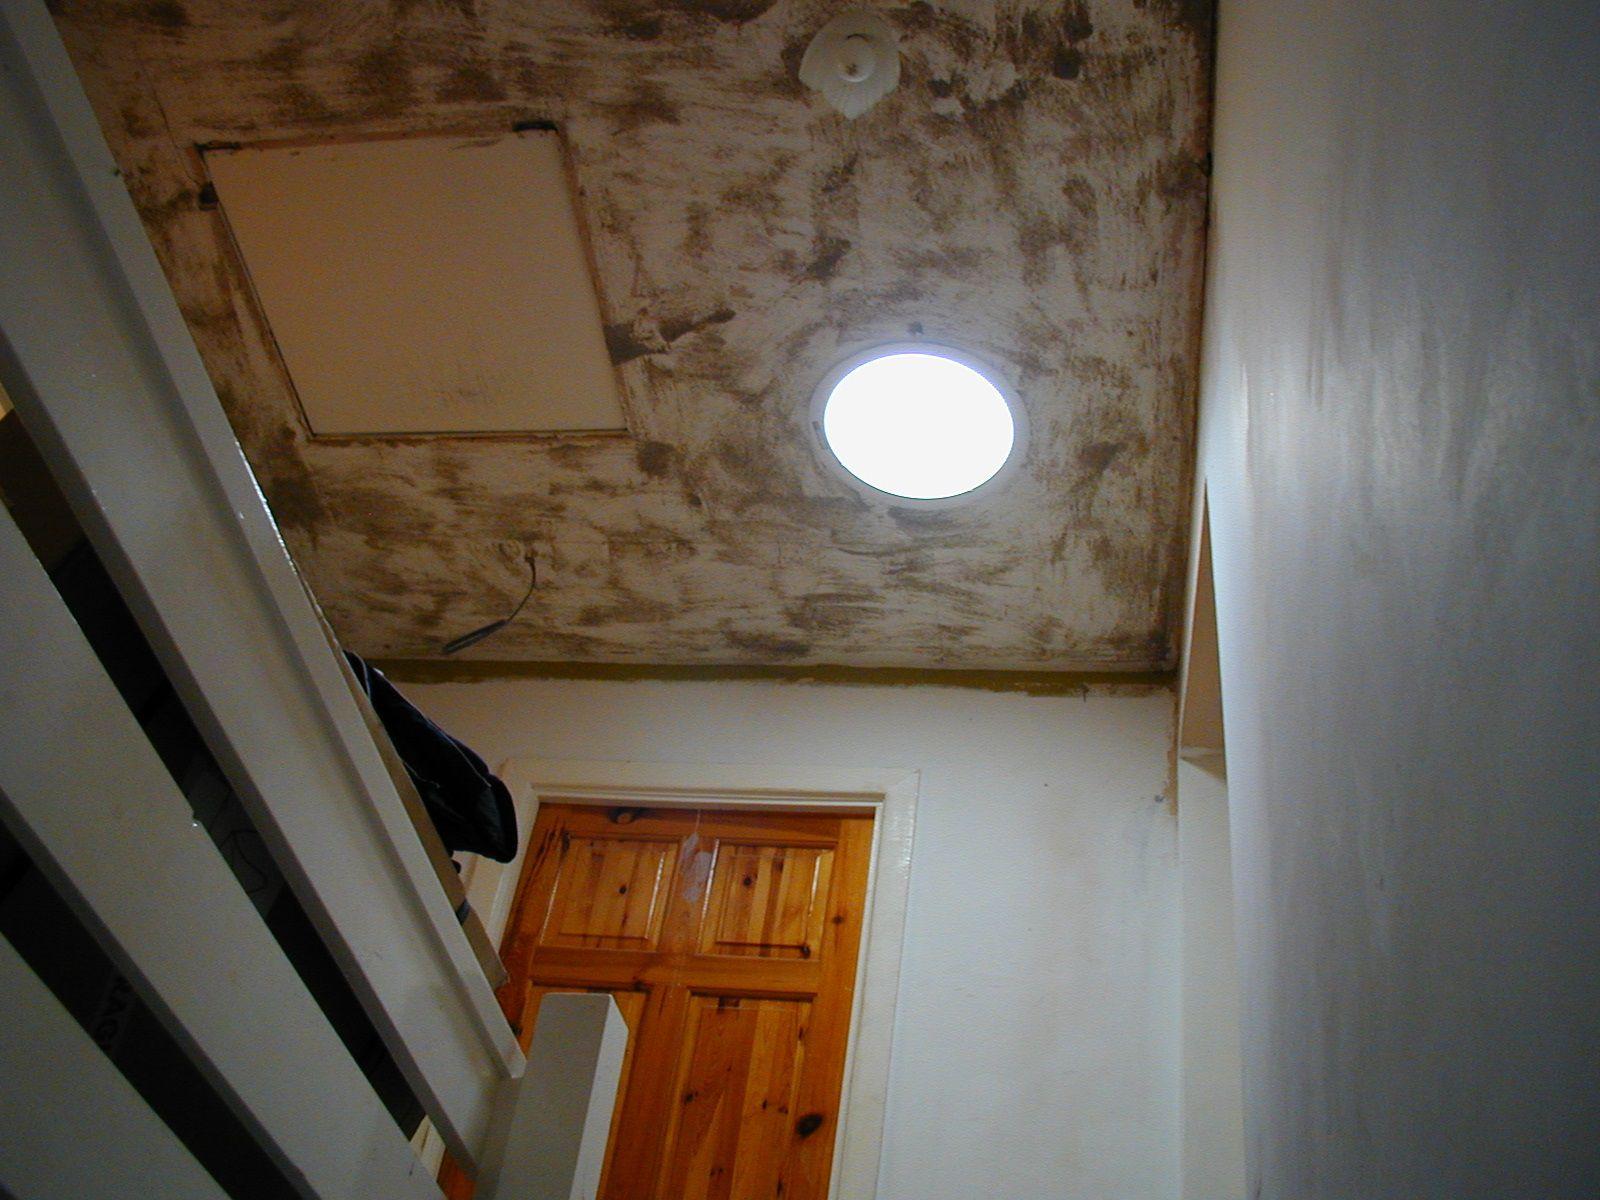 Sun Tubes Are Alternatives To Skylights